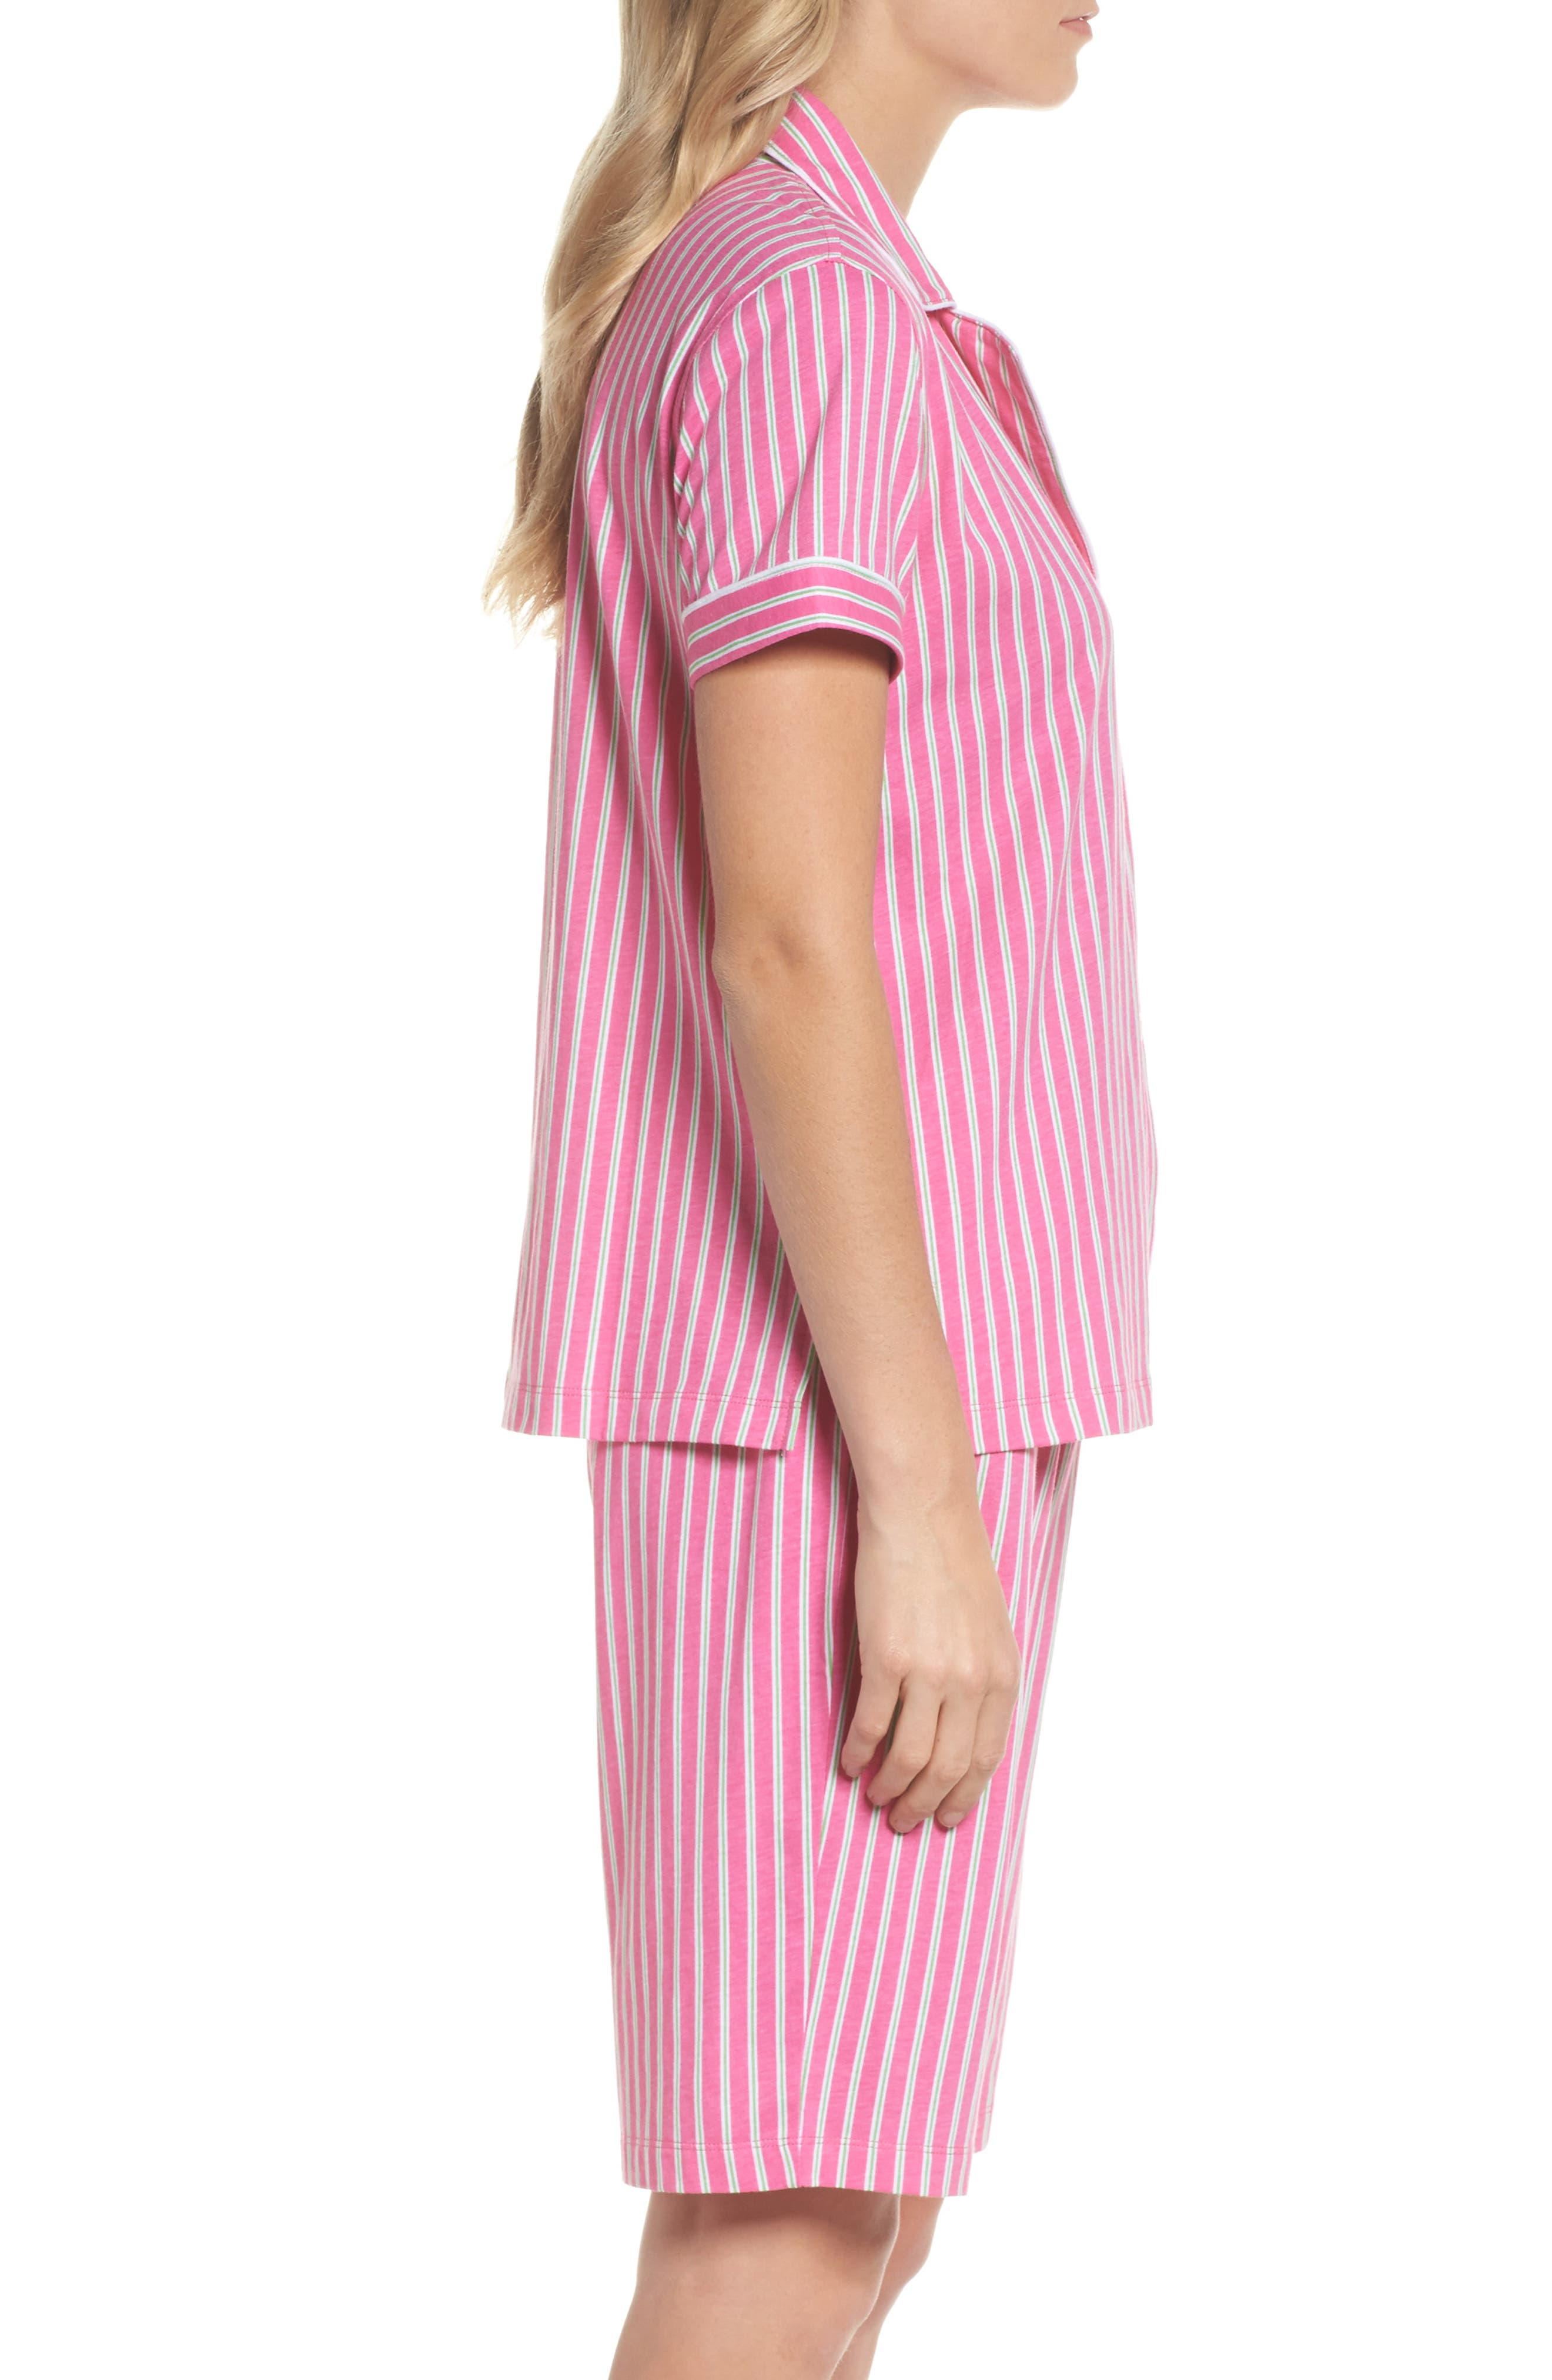 Bermuda Pajamas,                             Alternate thumbnail 2, color,                             674